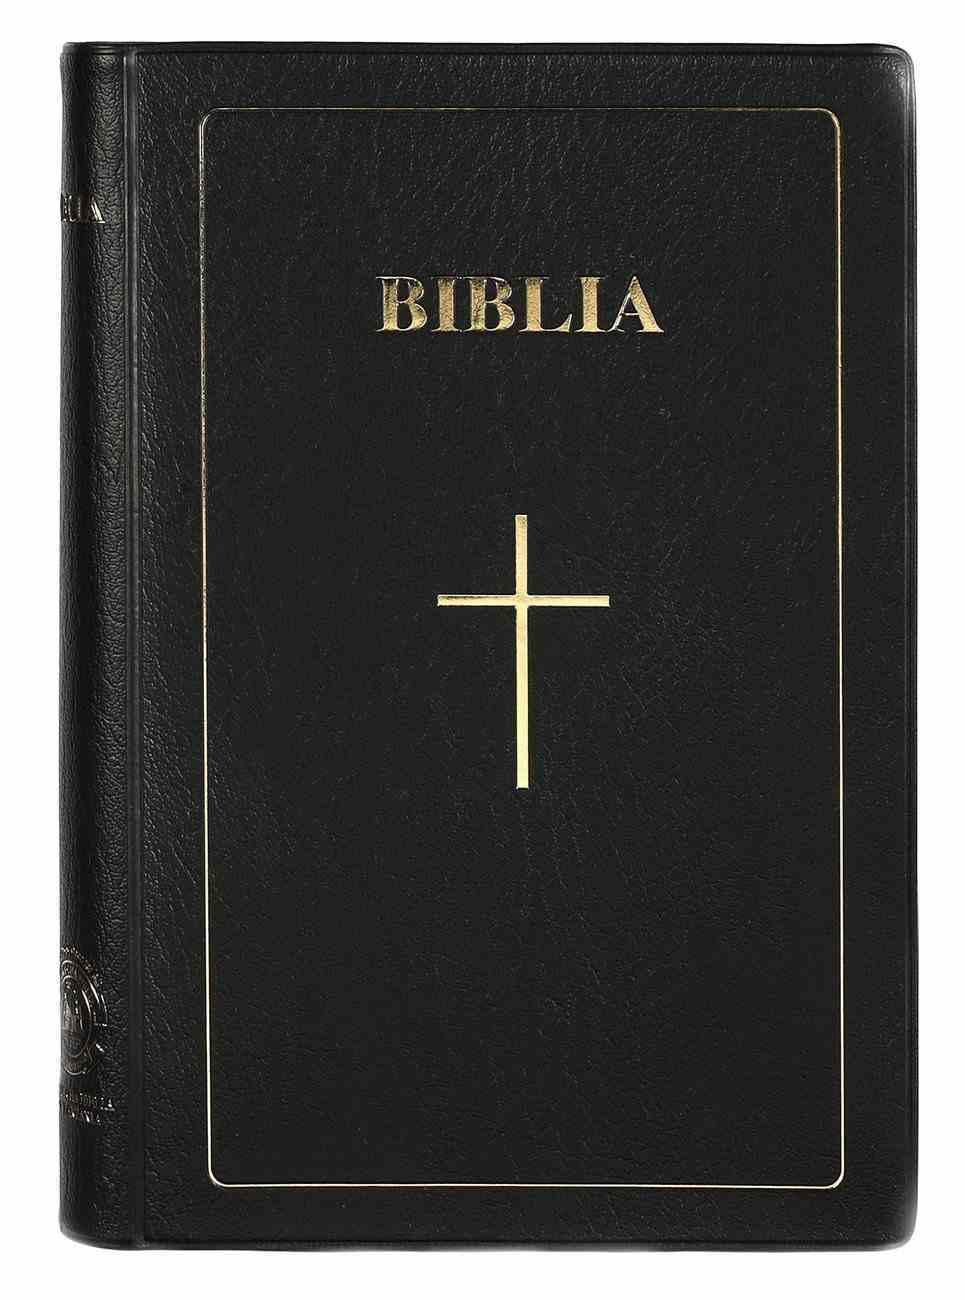 Swahili Bible Traditional Translation Imitation Leather